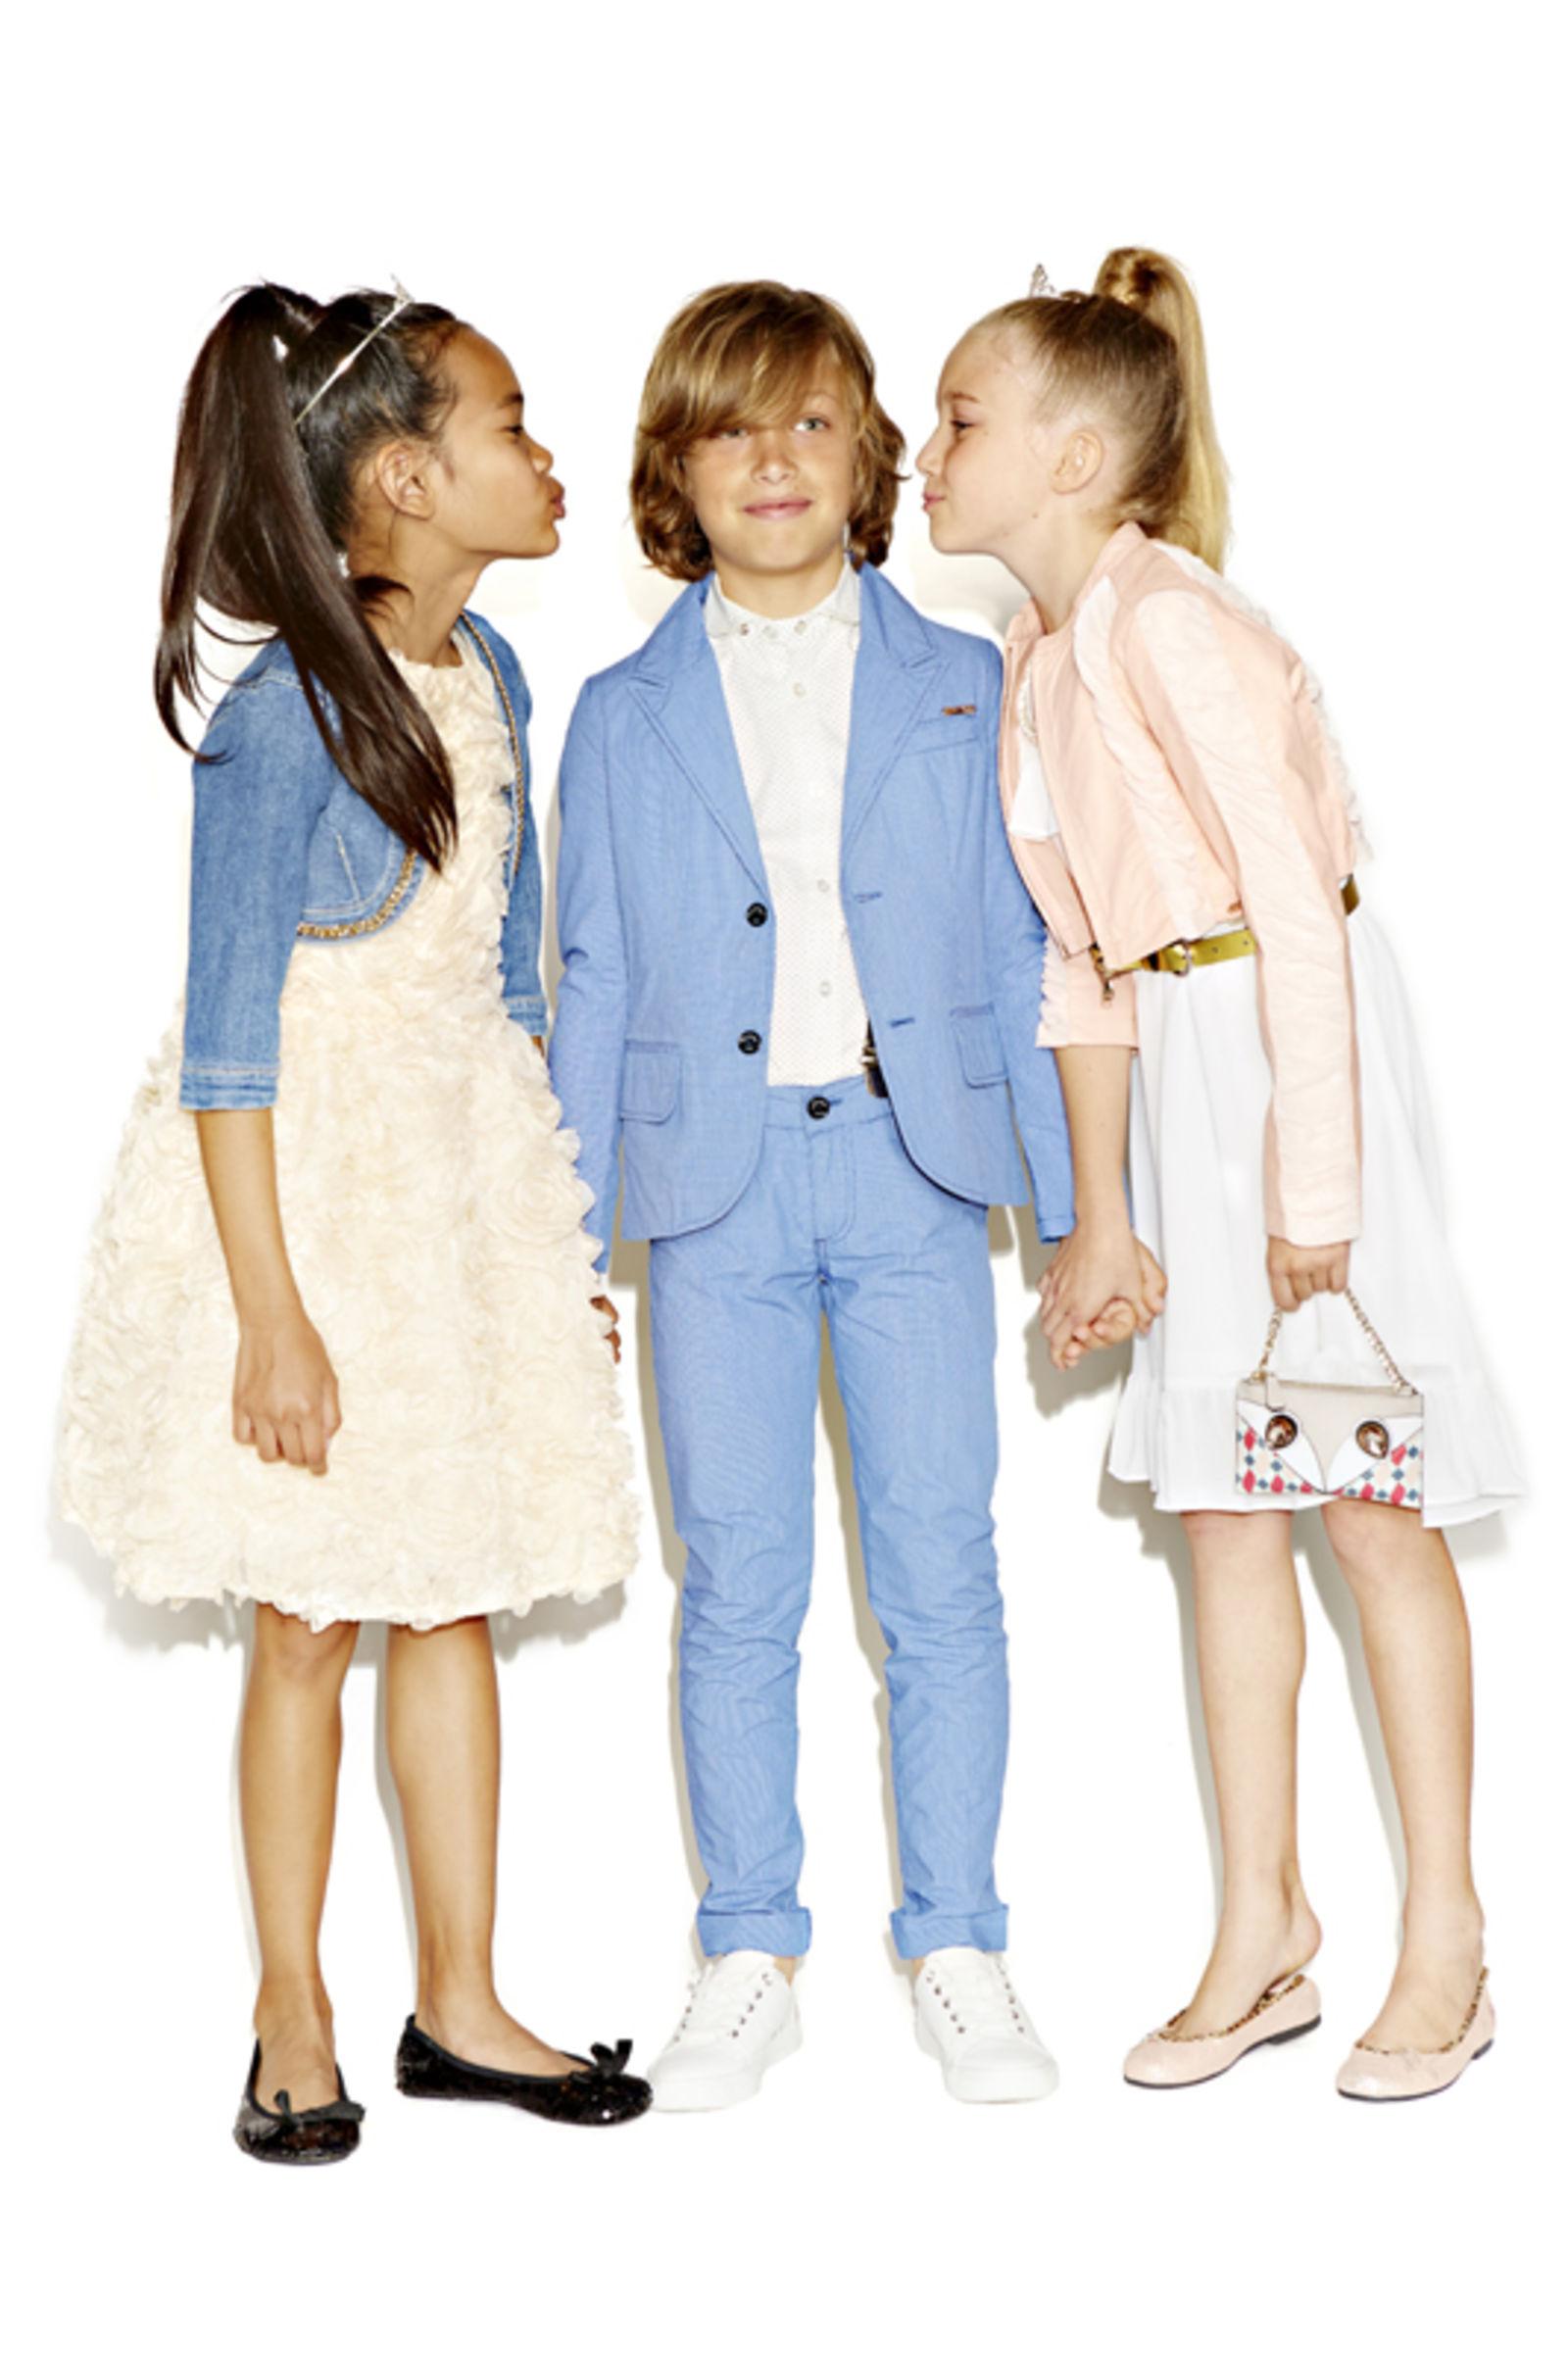 GUESS Kids (Image 2)